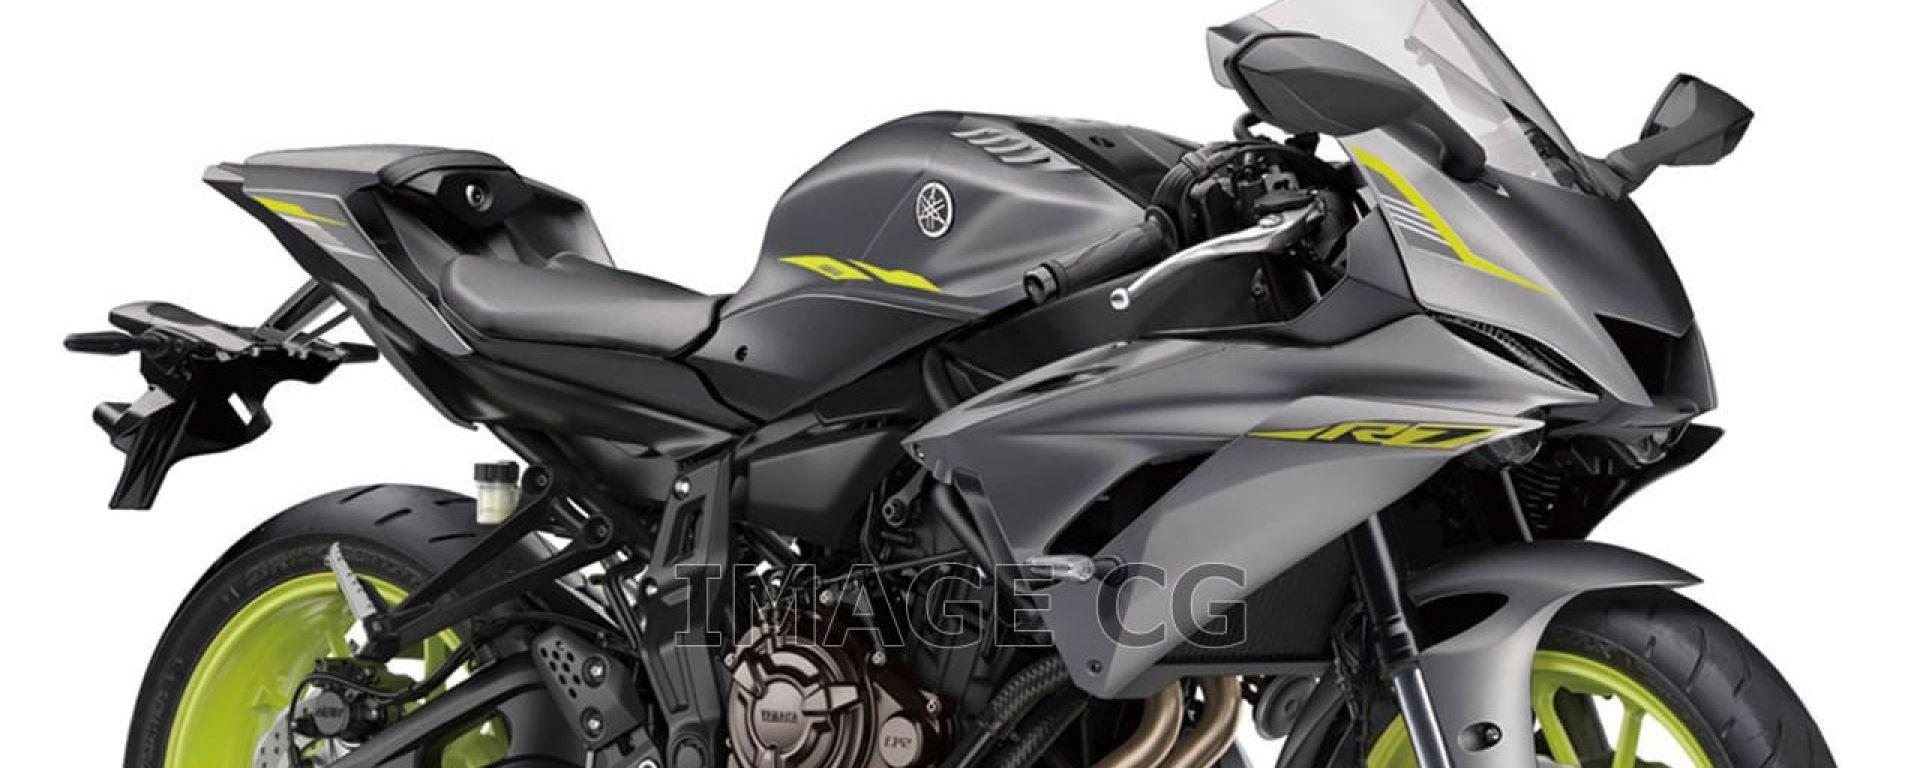 Yamaha YZF-R7: se la supersportiva su base MT-07 diventasse realtà?